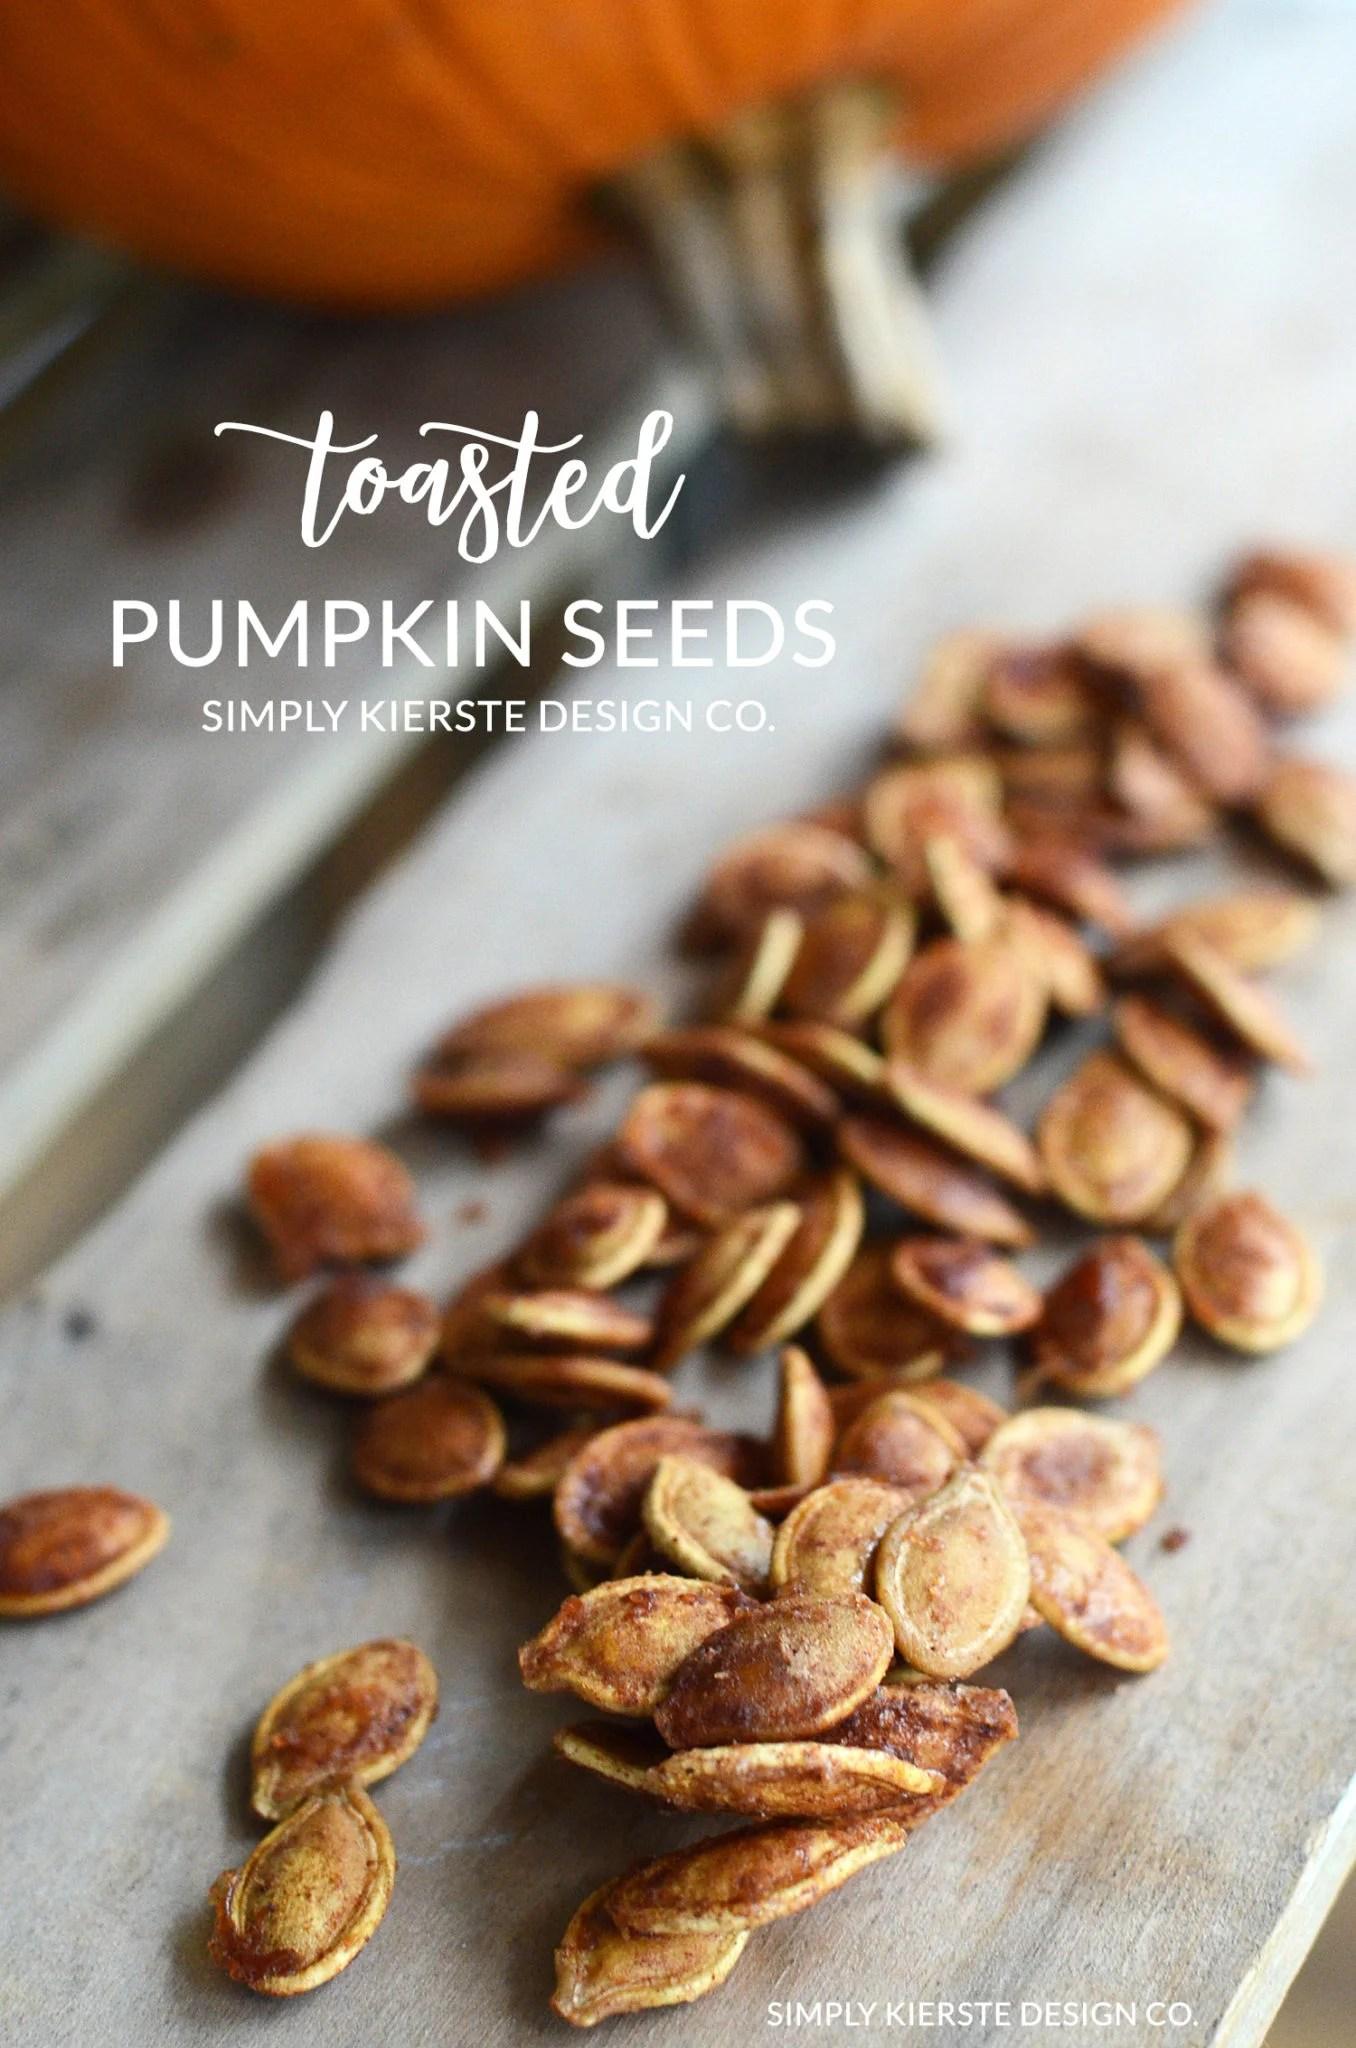 Toasted Pumpkin Seeds   Cinnamon & Sugar Pumpkin Seeds   Fall Recipes   oldsaltfarm.com